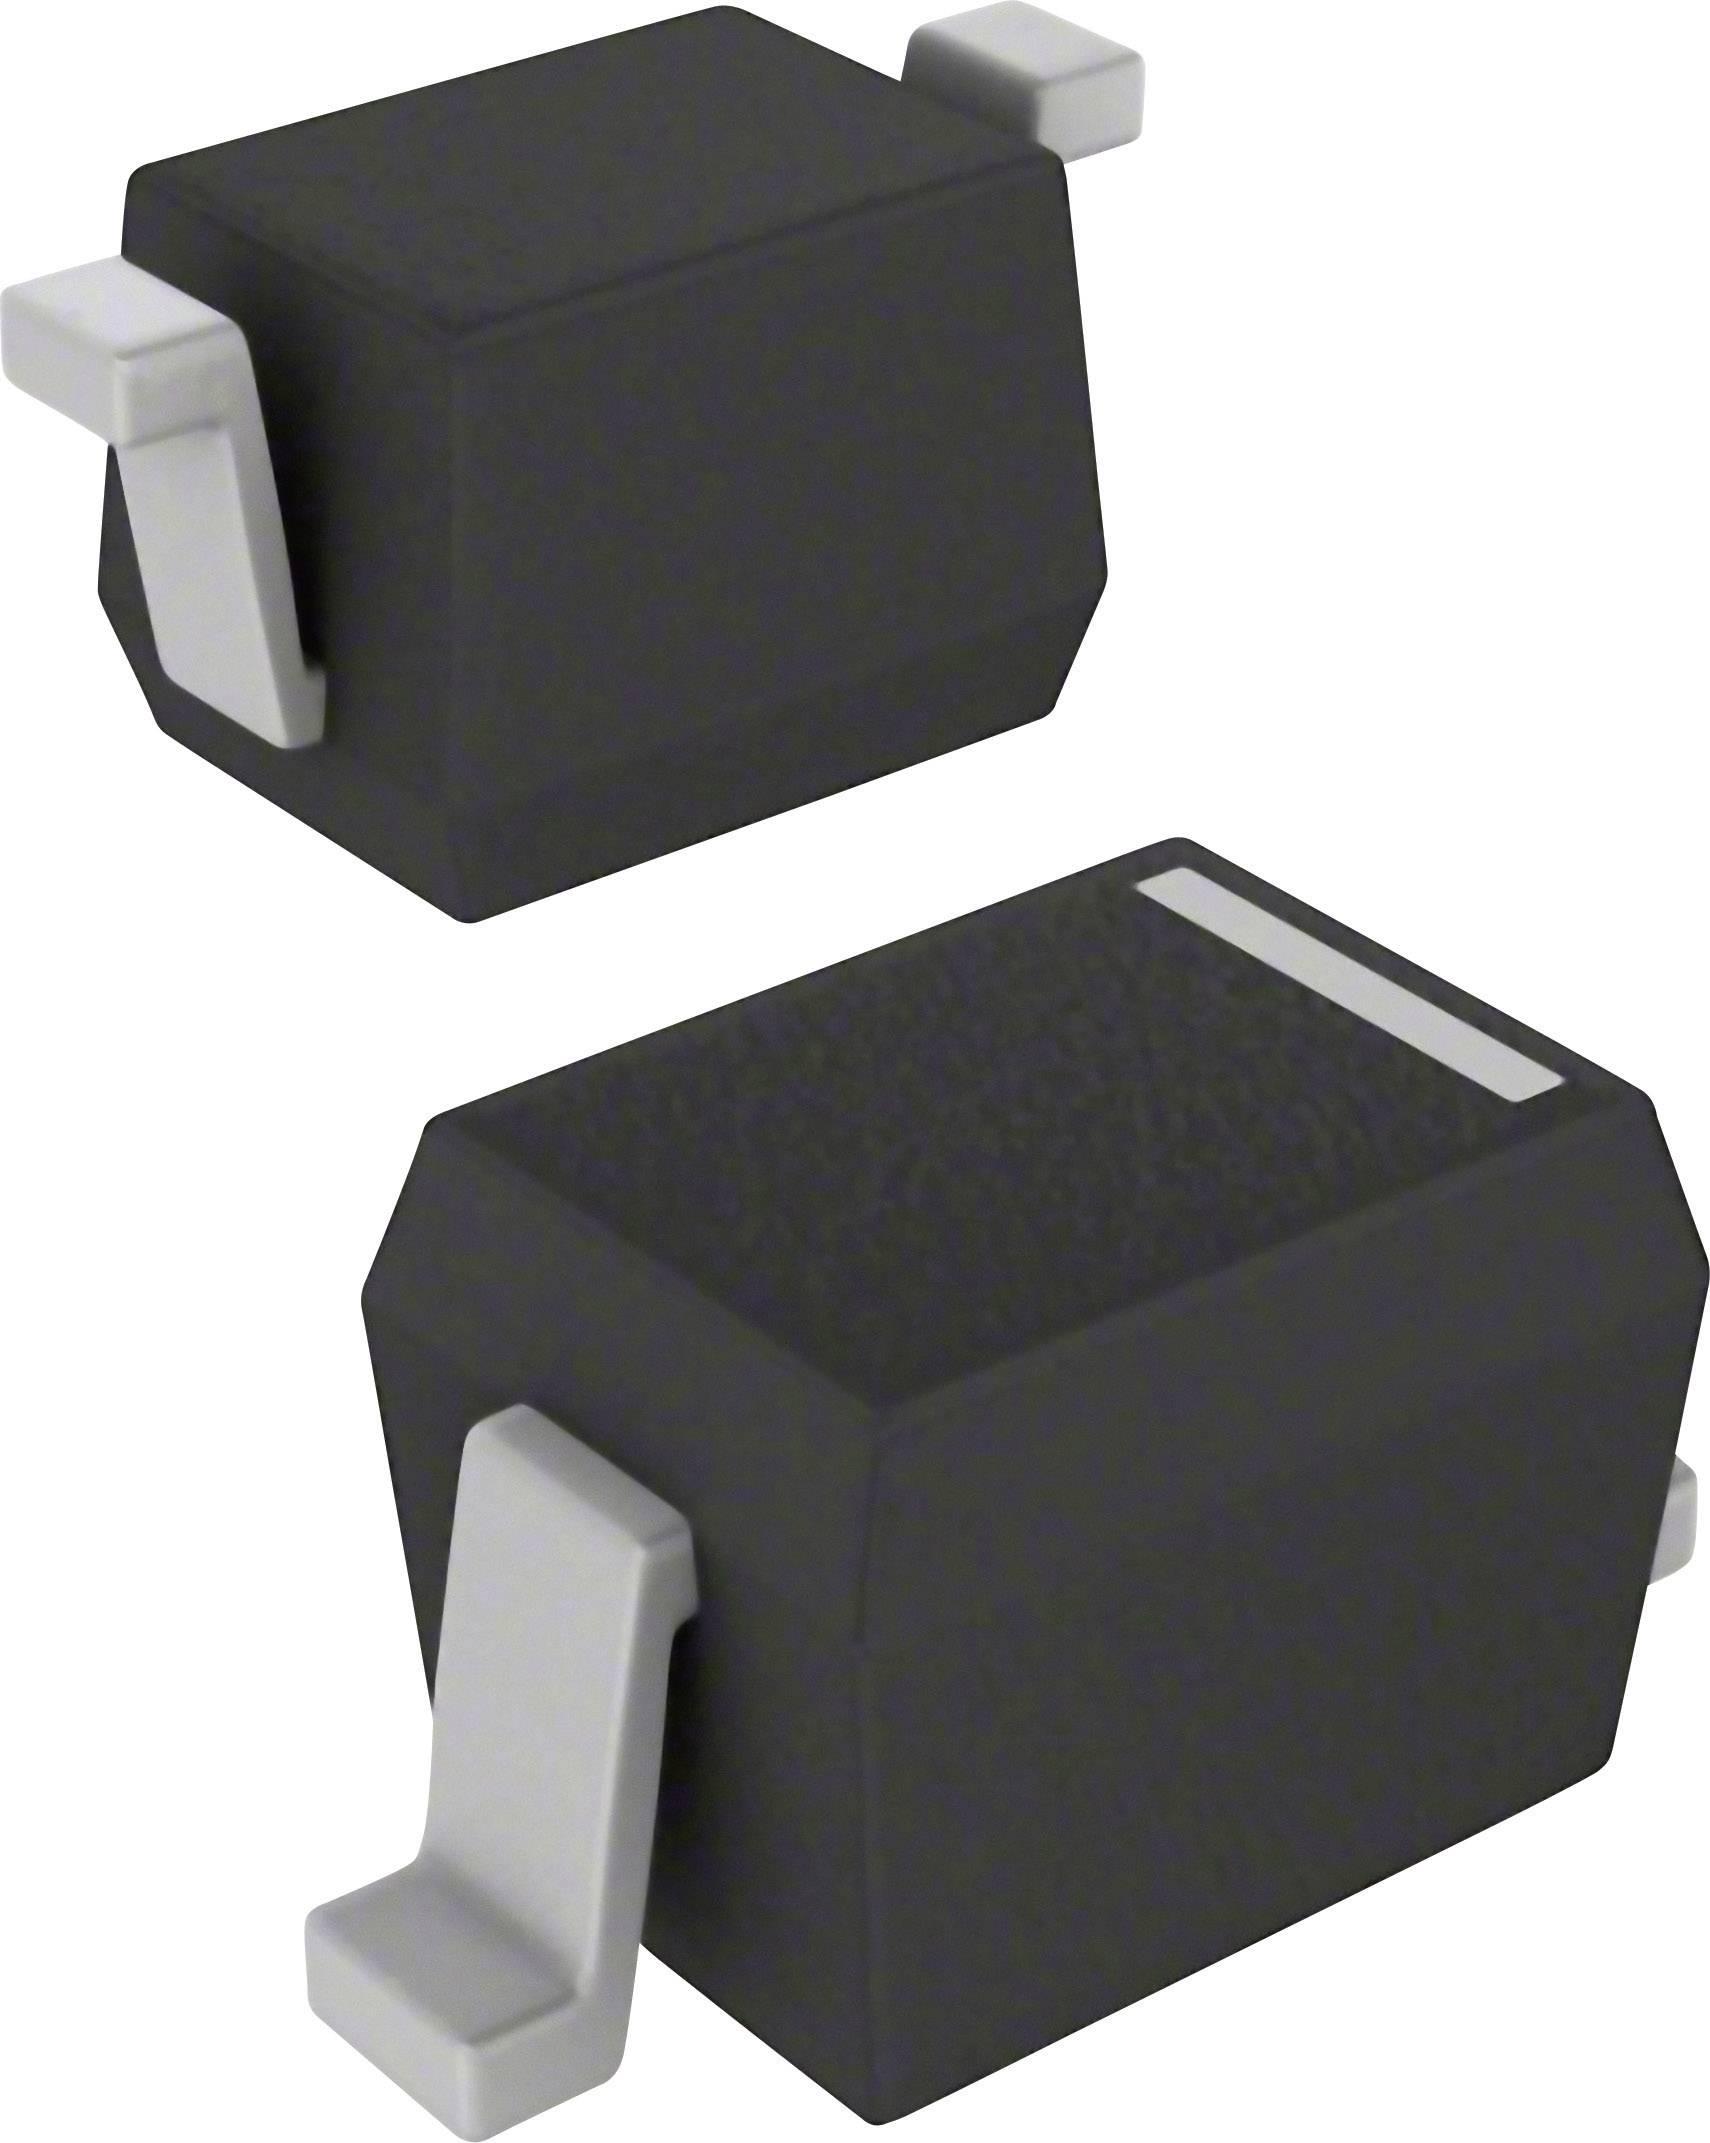 PIN - jednoduchá Infineon Technologies BA595 BA595 SOD-323, 50 mA, 50 V